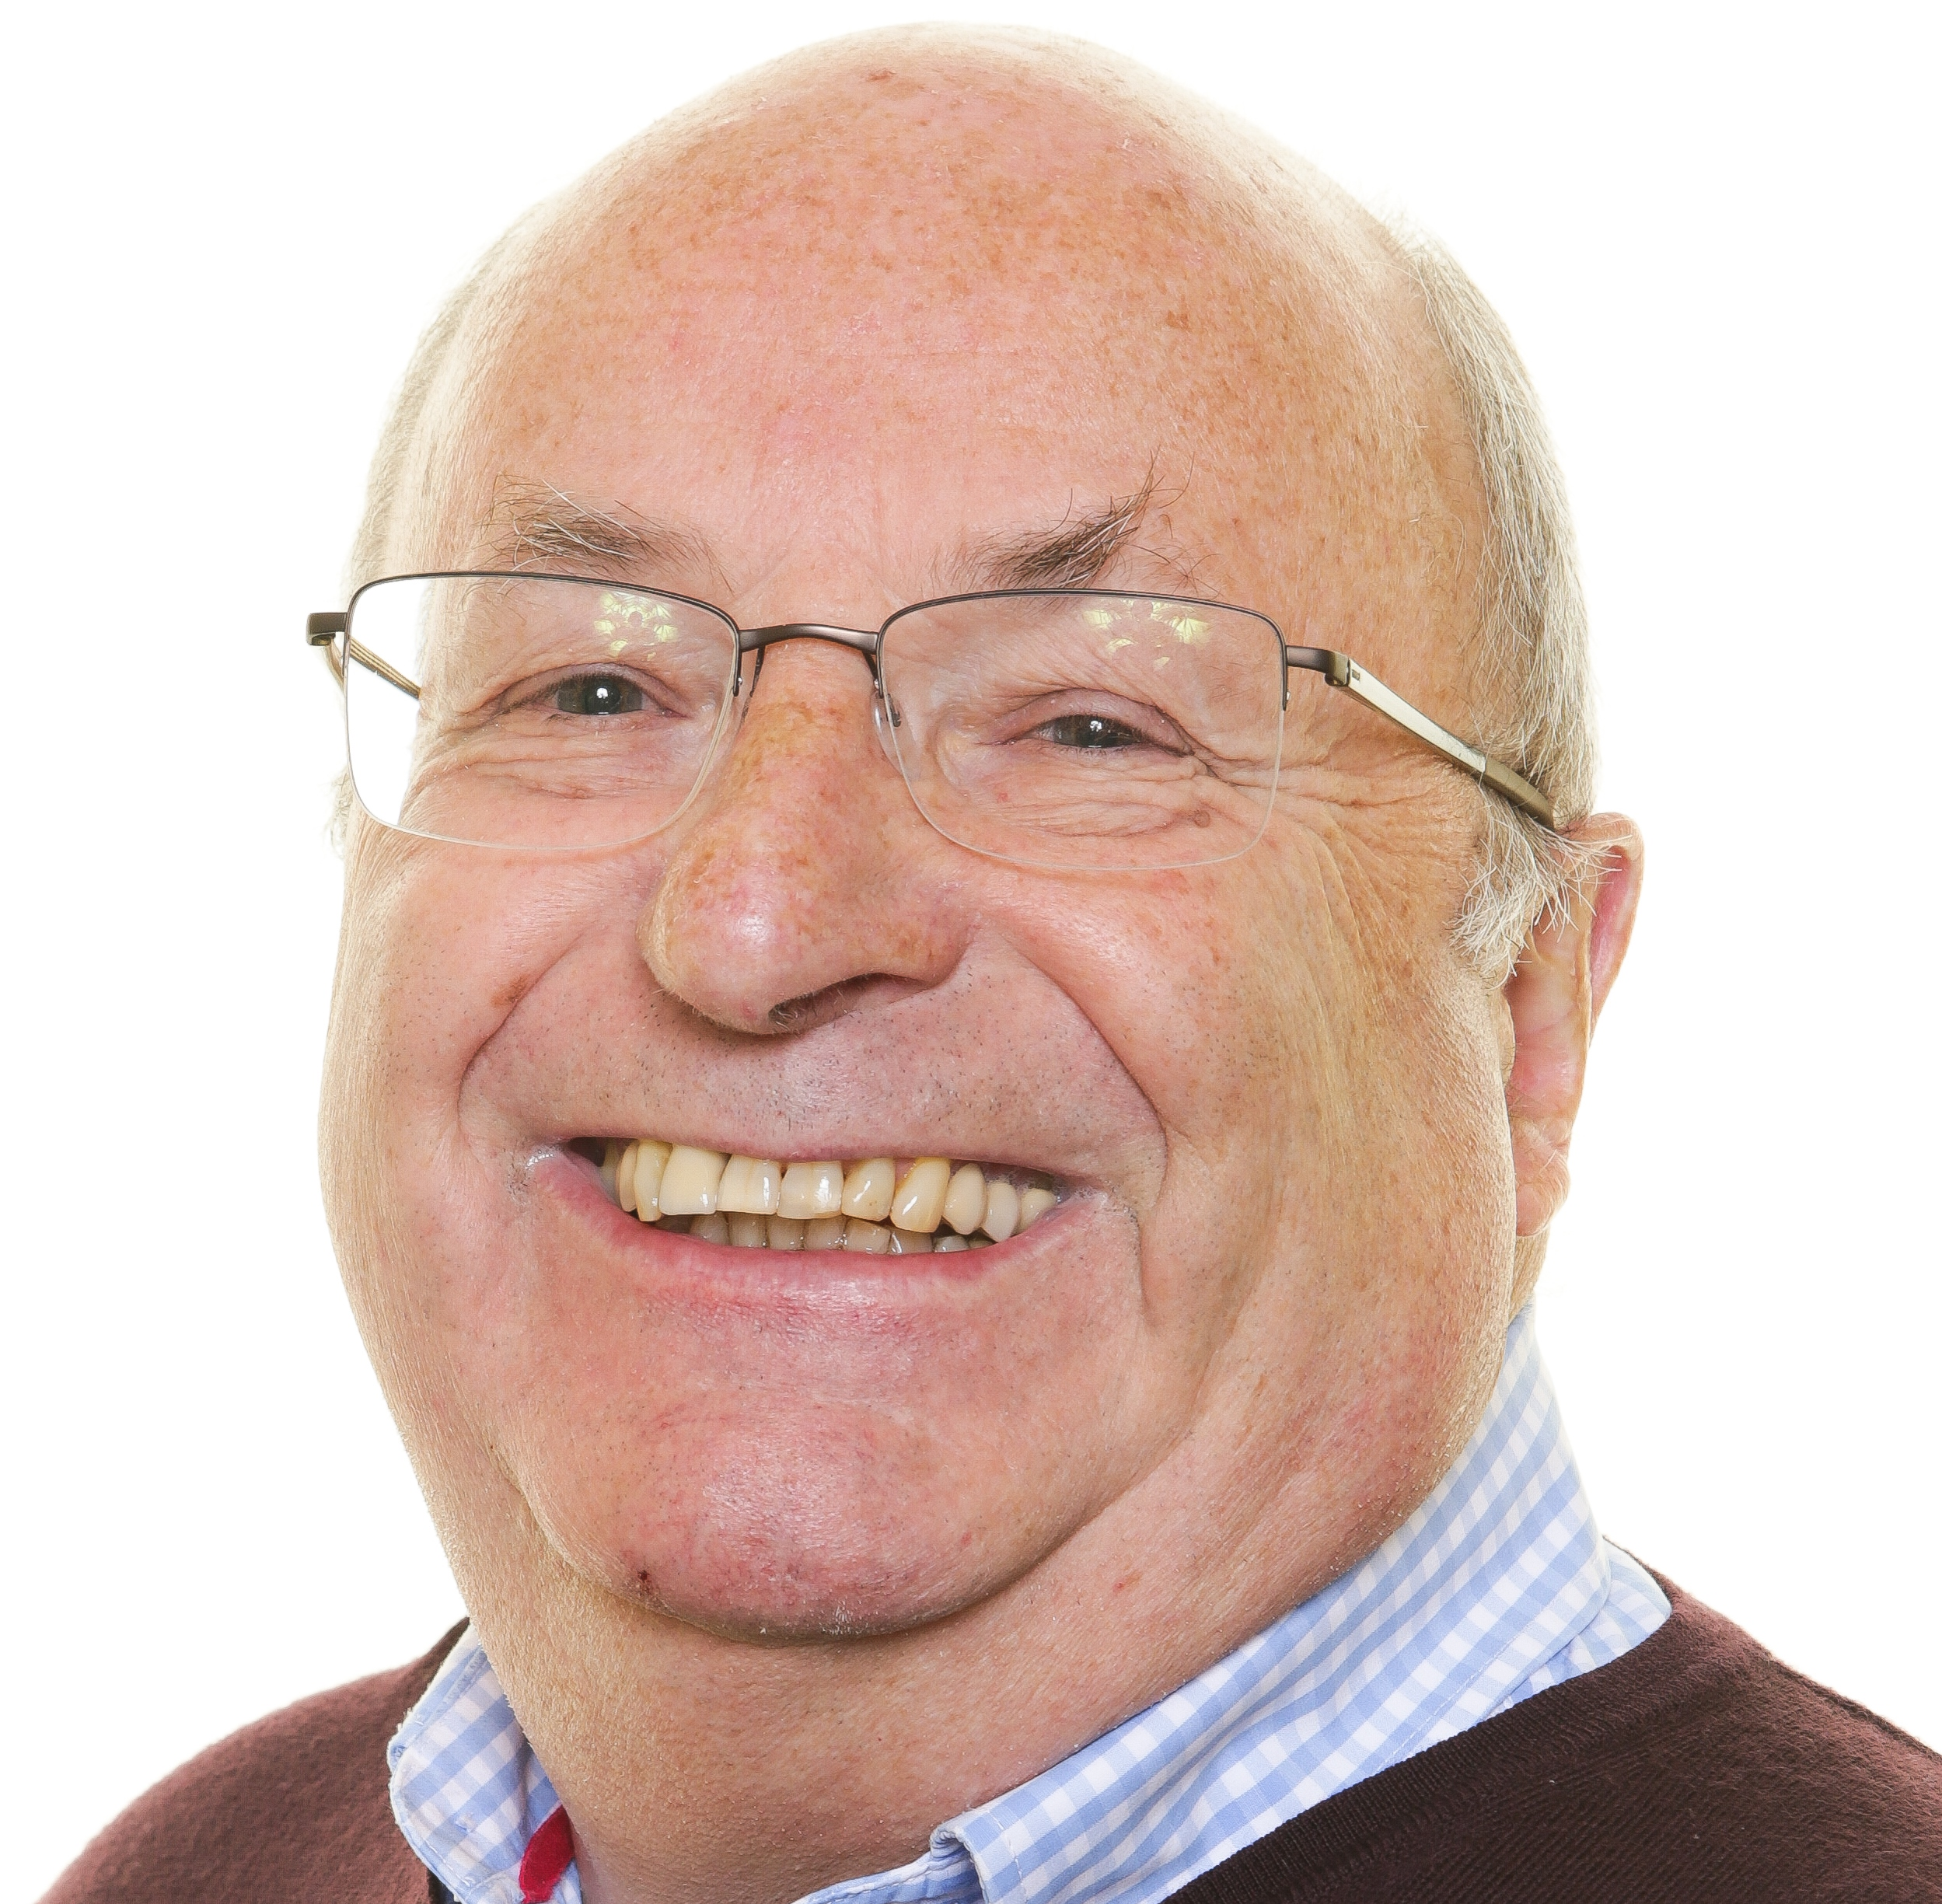 David Martin, East Ward: Independent